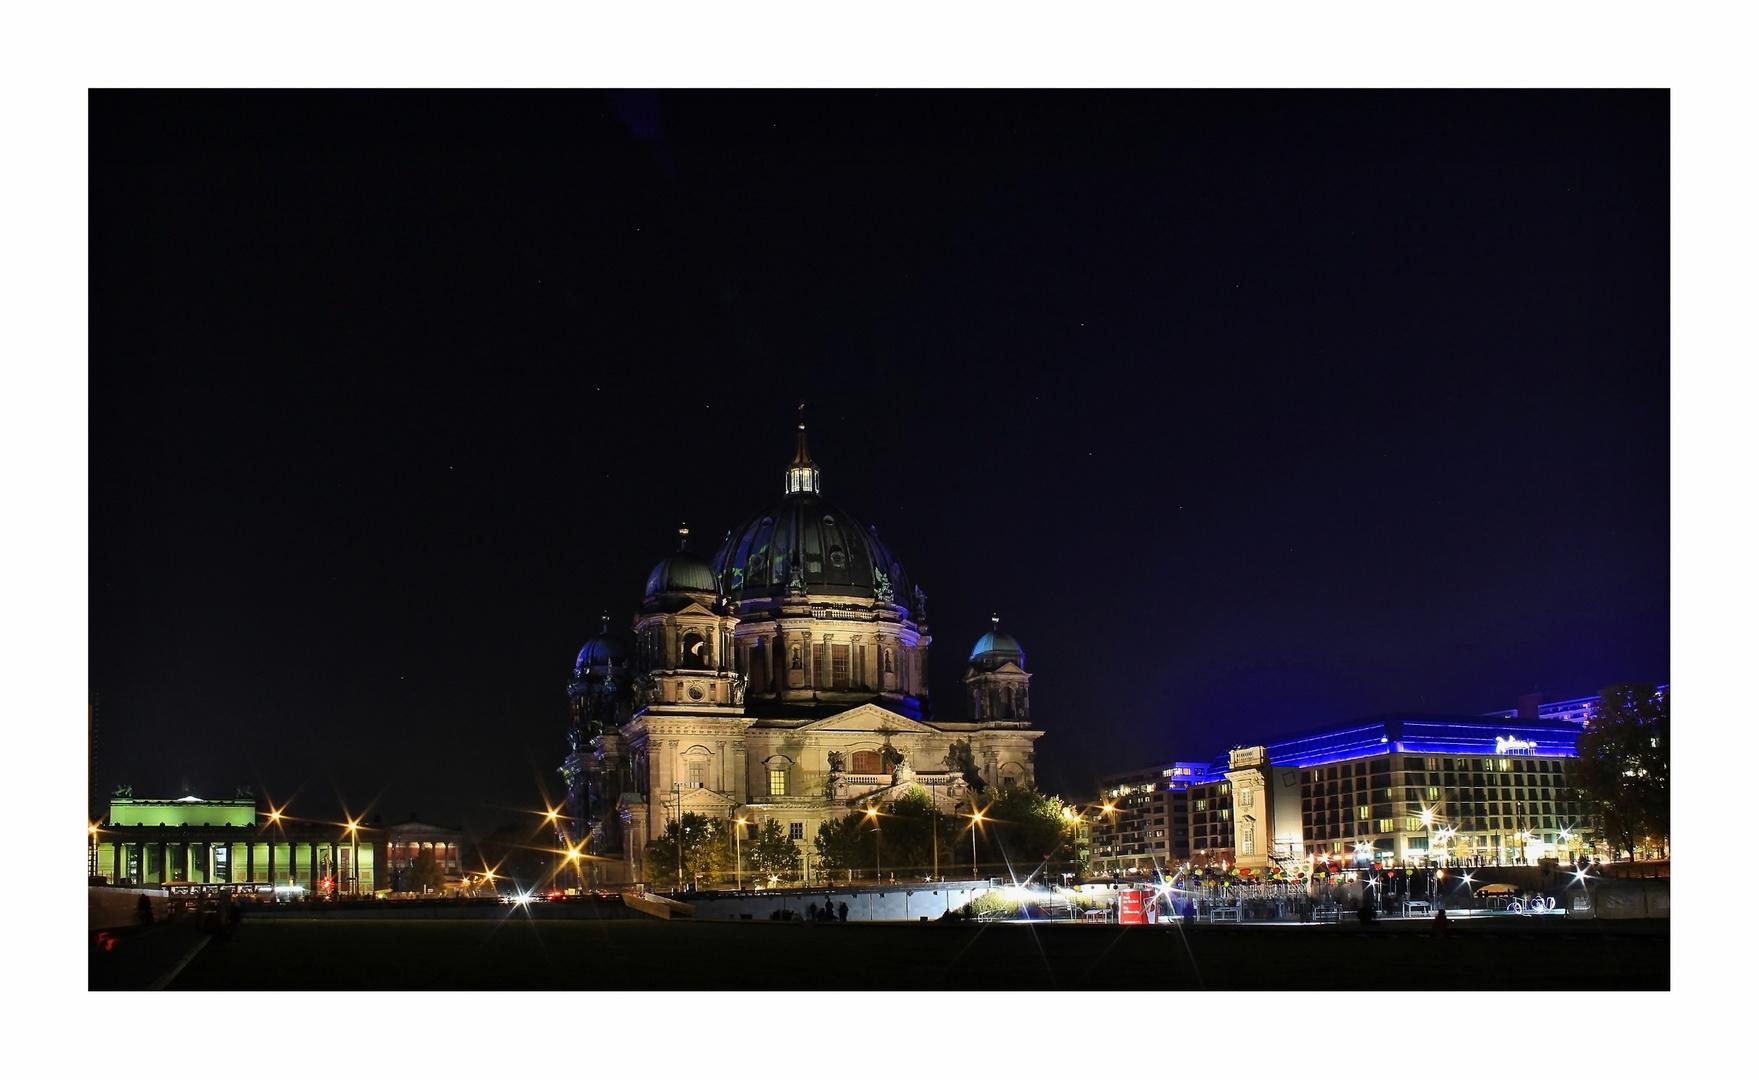 Am Berliner Dom